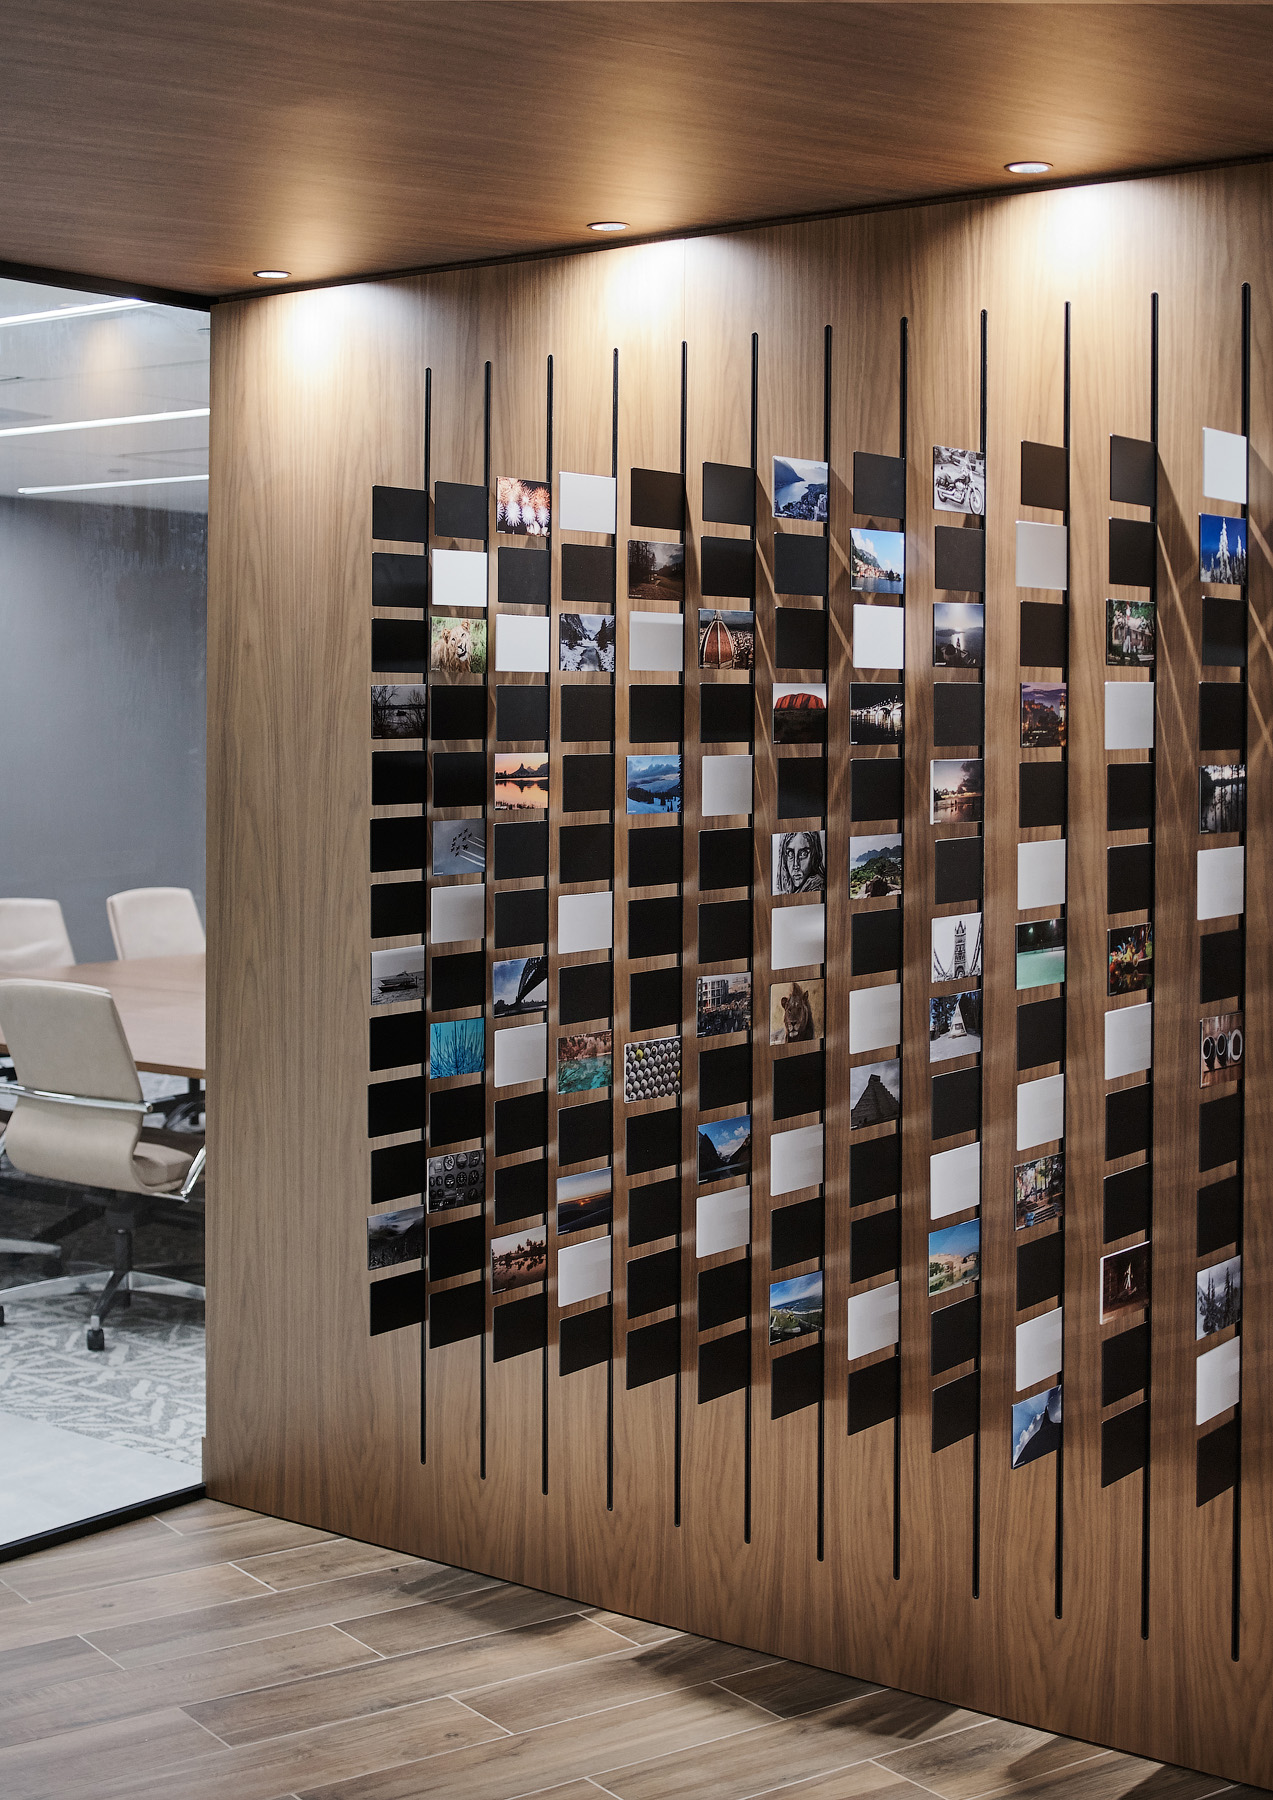 Optimus Toronto art wall with various photos representing DNA pattern